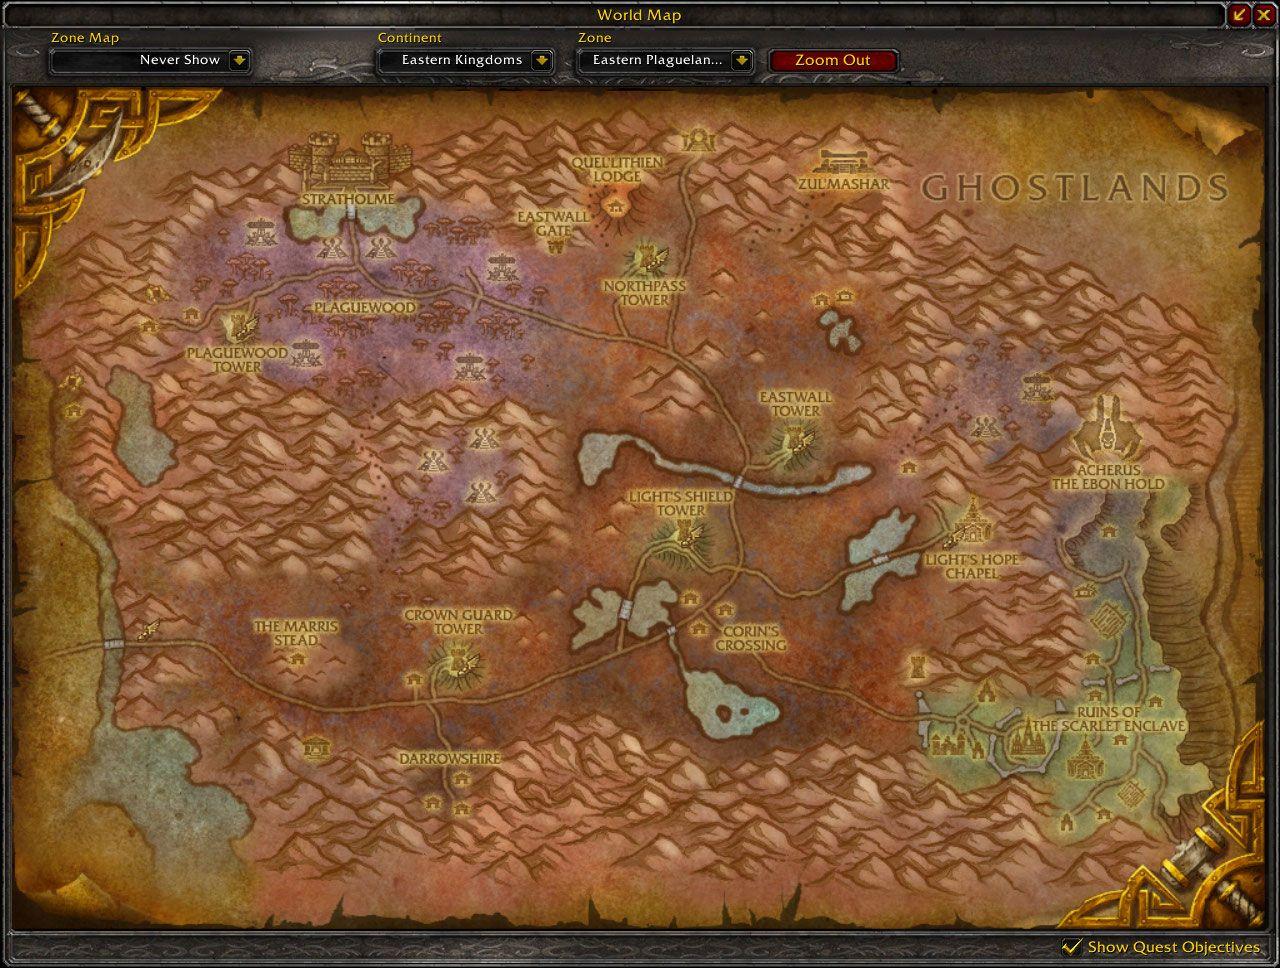 Eastern plaguelands cataclysm map wow screenshot gamingcfg eastern plaguelands cataclysm map wow screenshot gumiabroncs Image collections